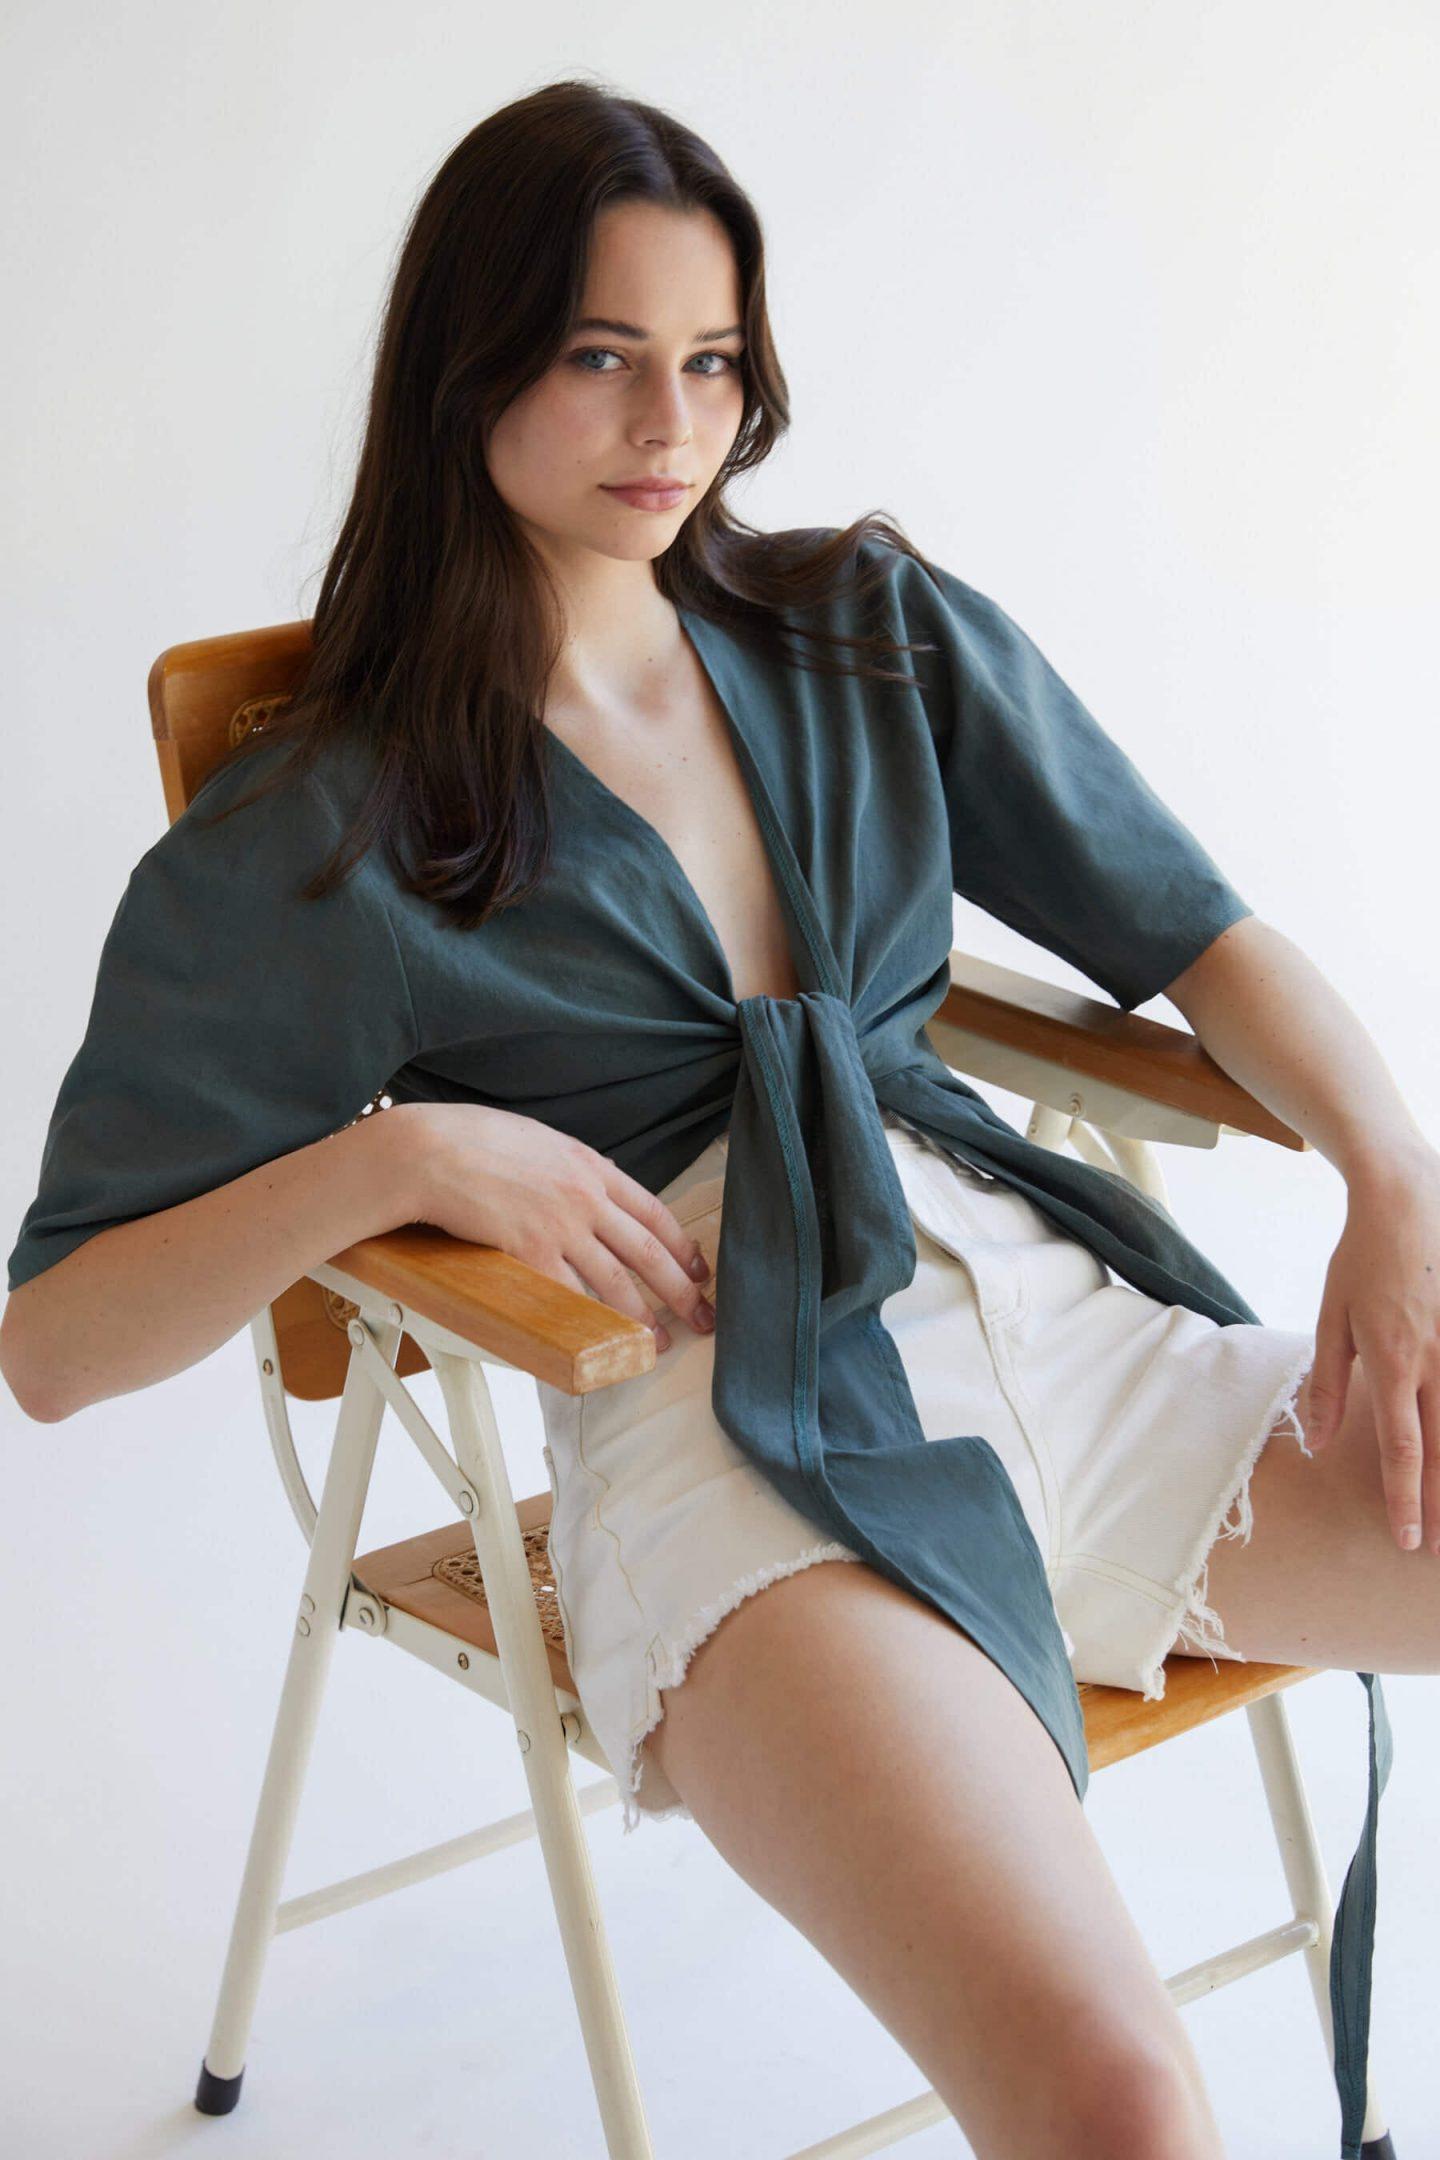 Blue-green knot top